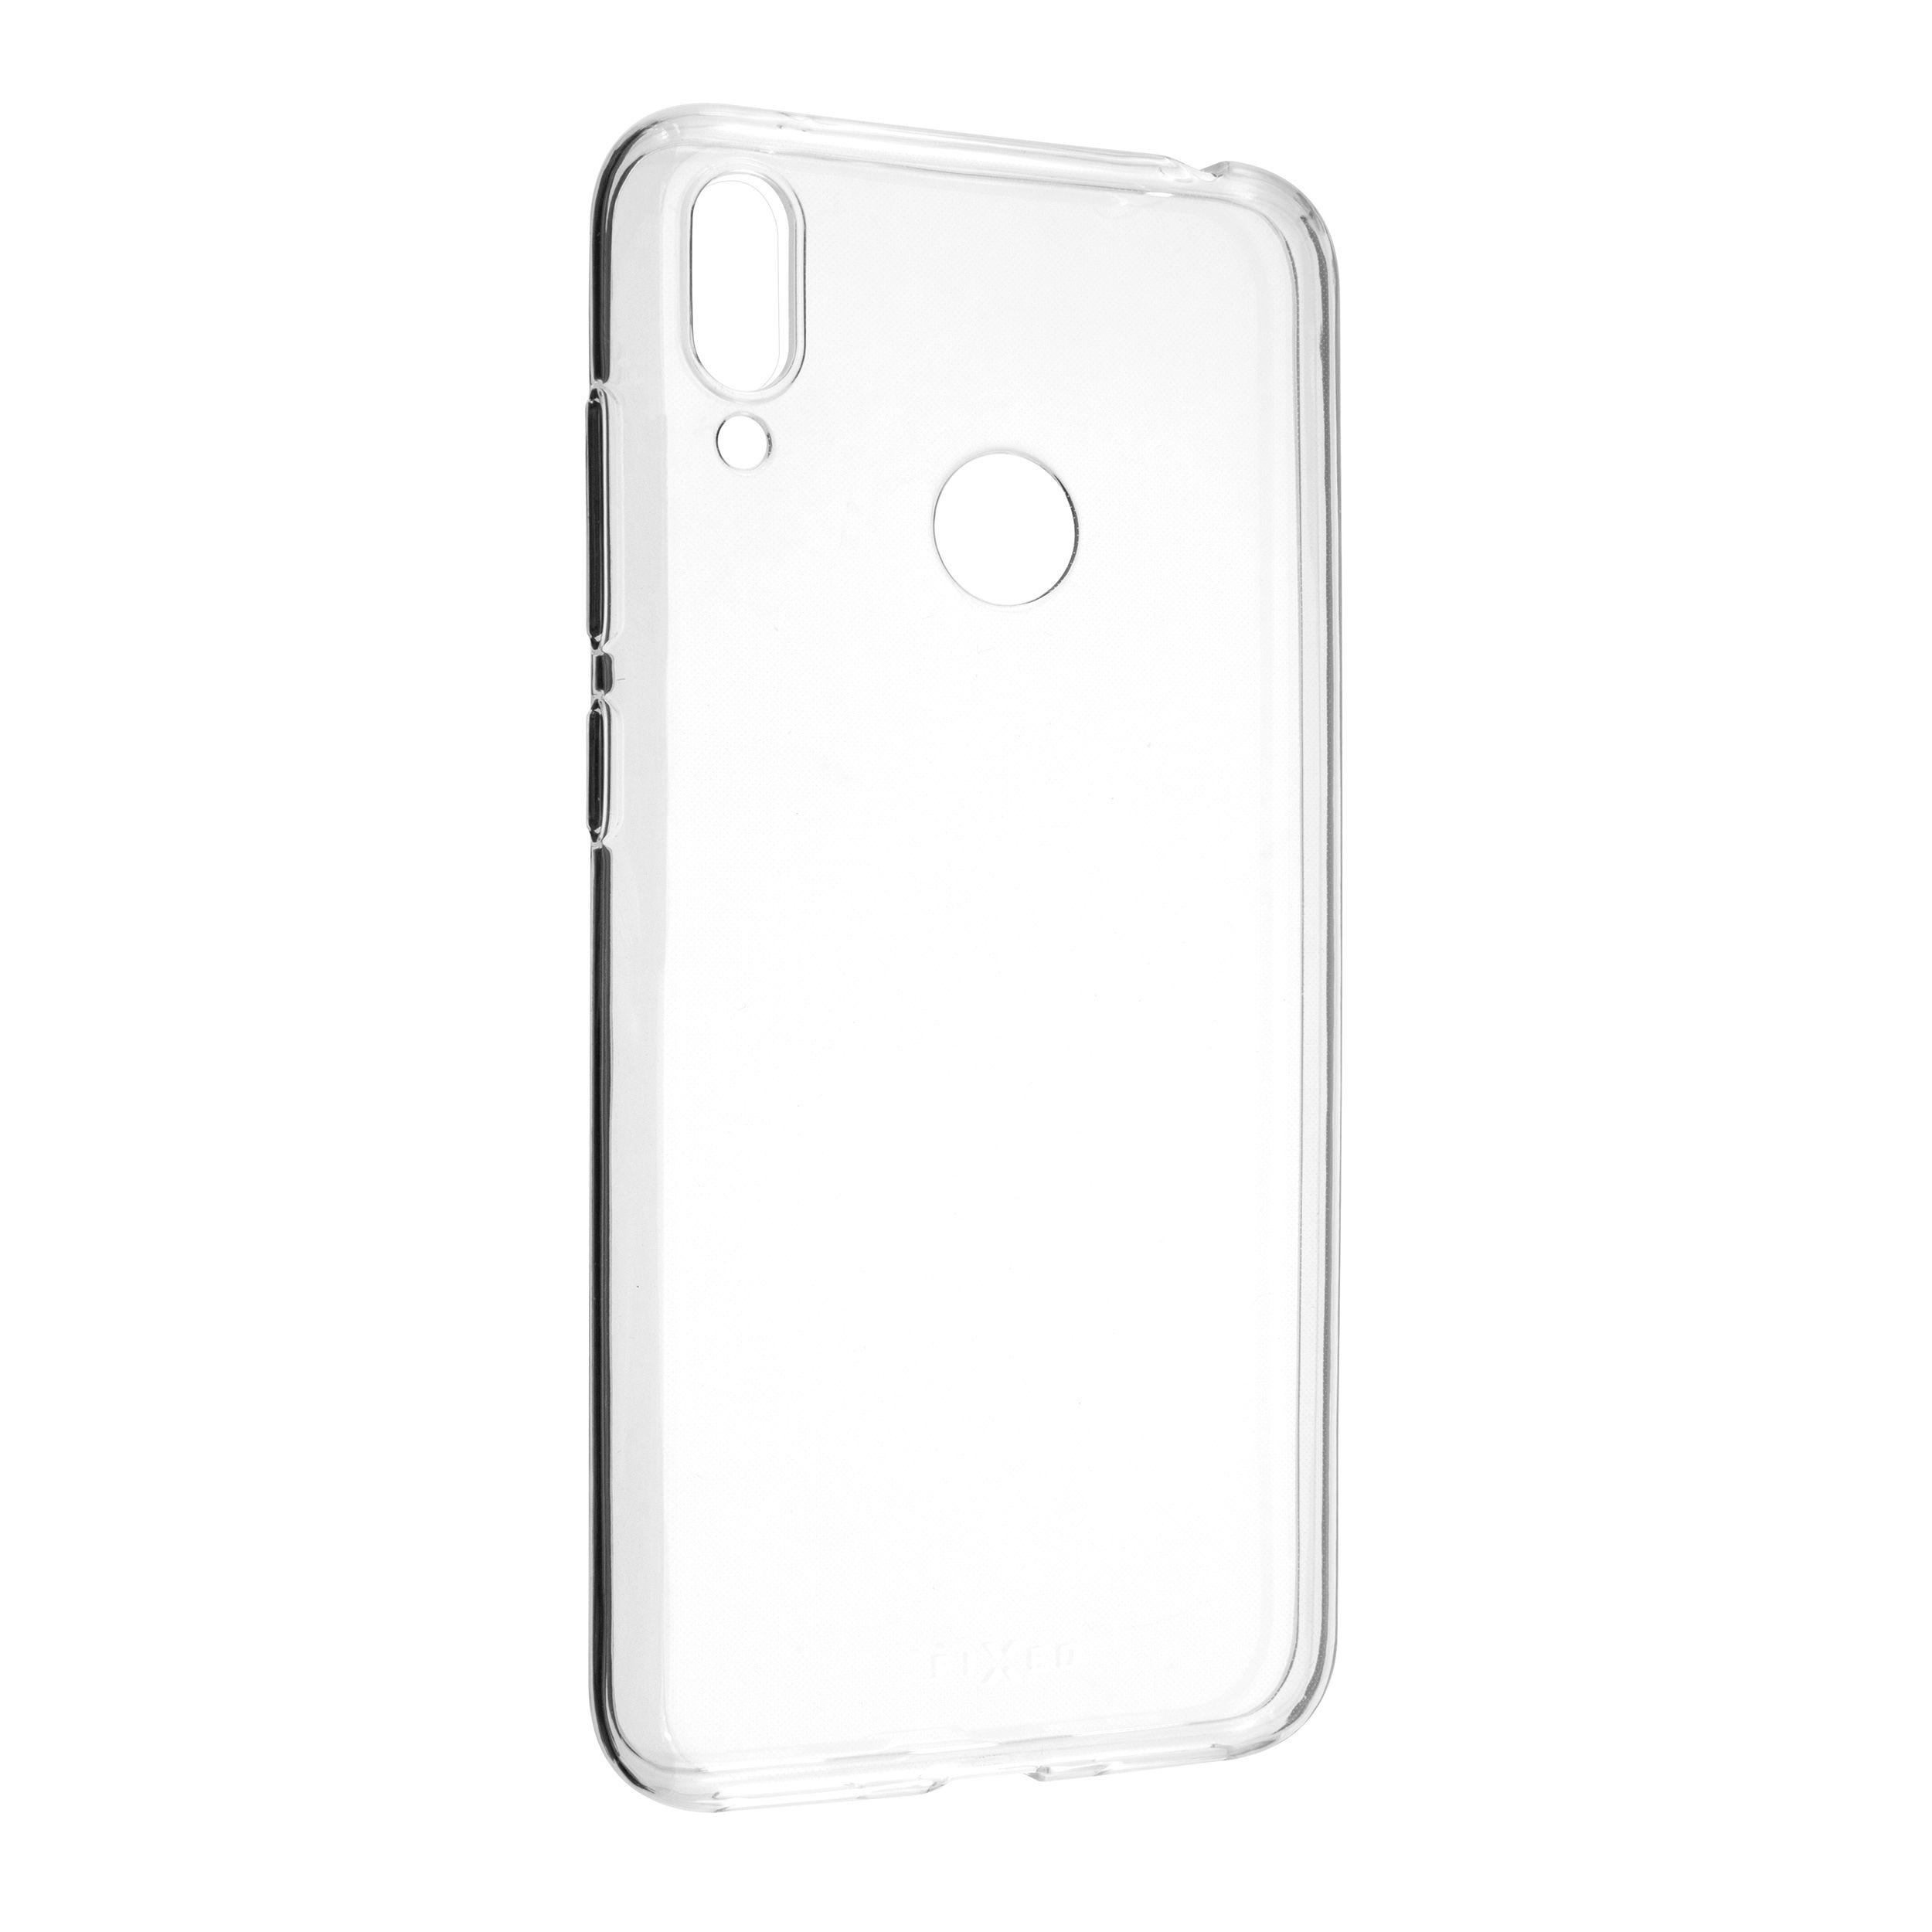 Ultratenké TPU gelové pouzdro FIXED Skin pro Huawei Y7 (2019), 0,6 mm, čiré